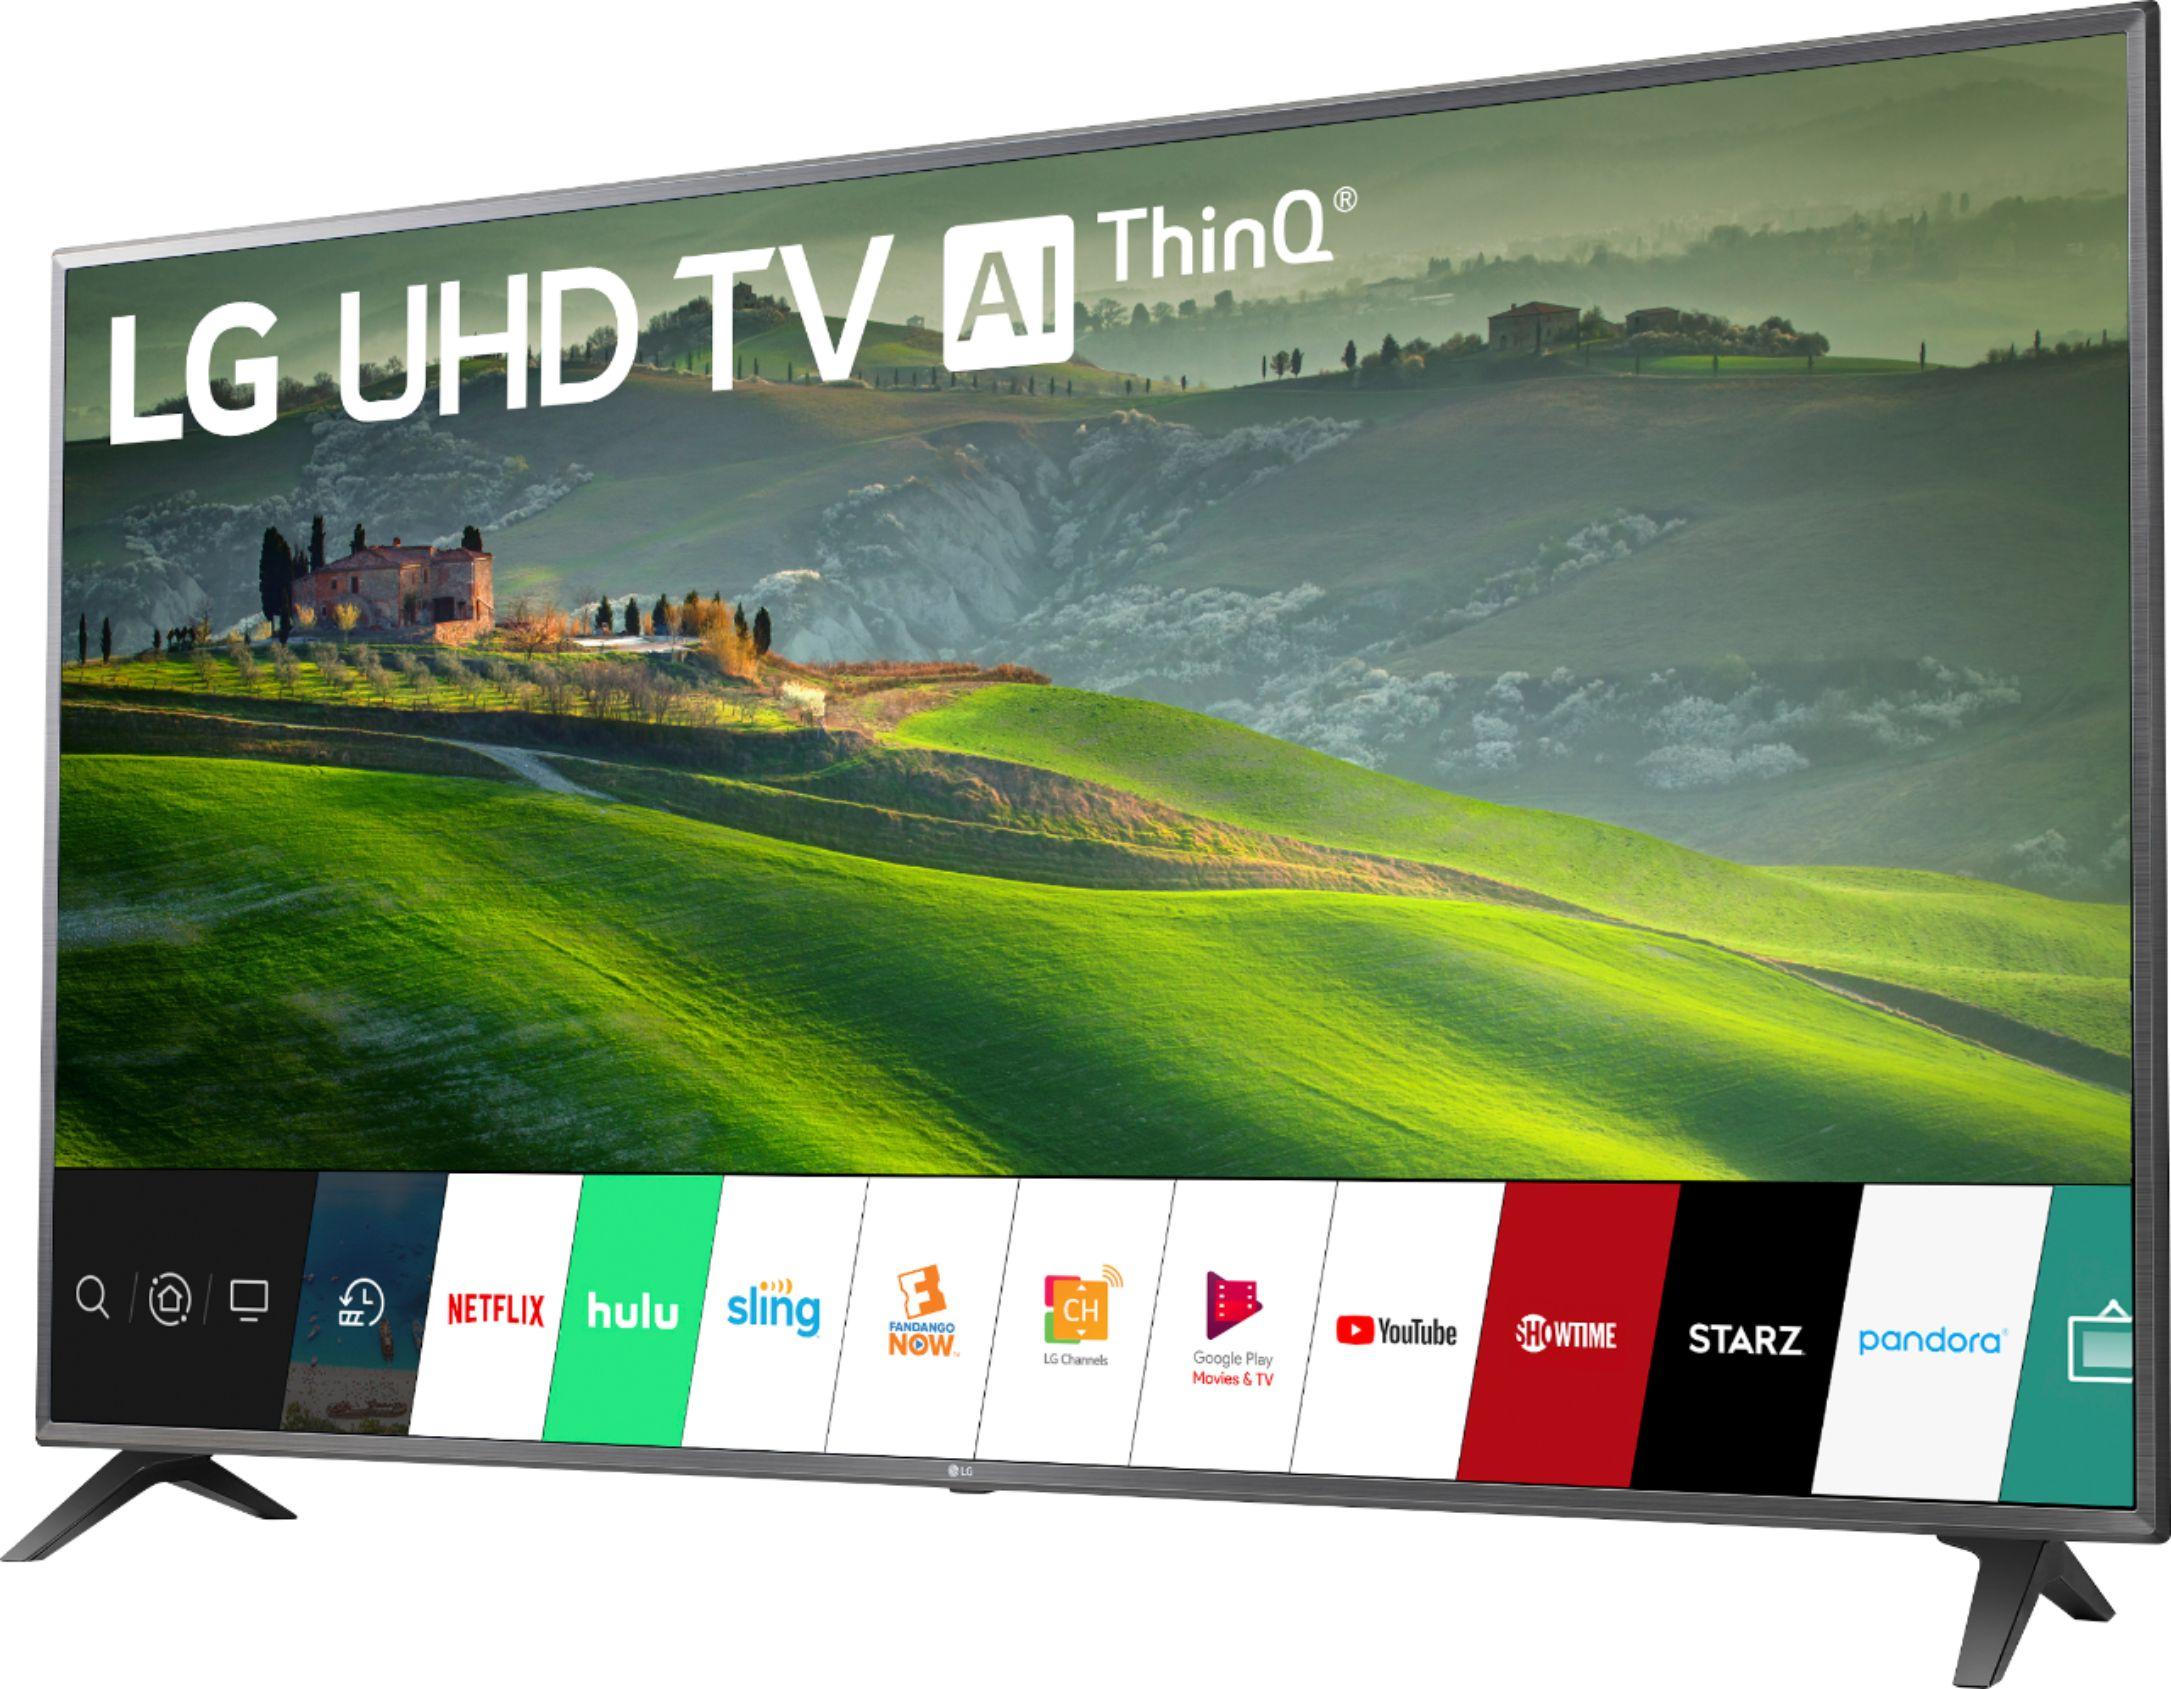 lg 70 class led um6970pua series led 4k uhd smart webos tv